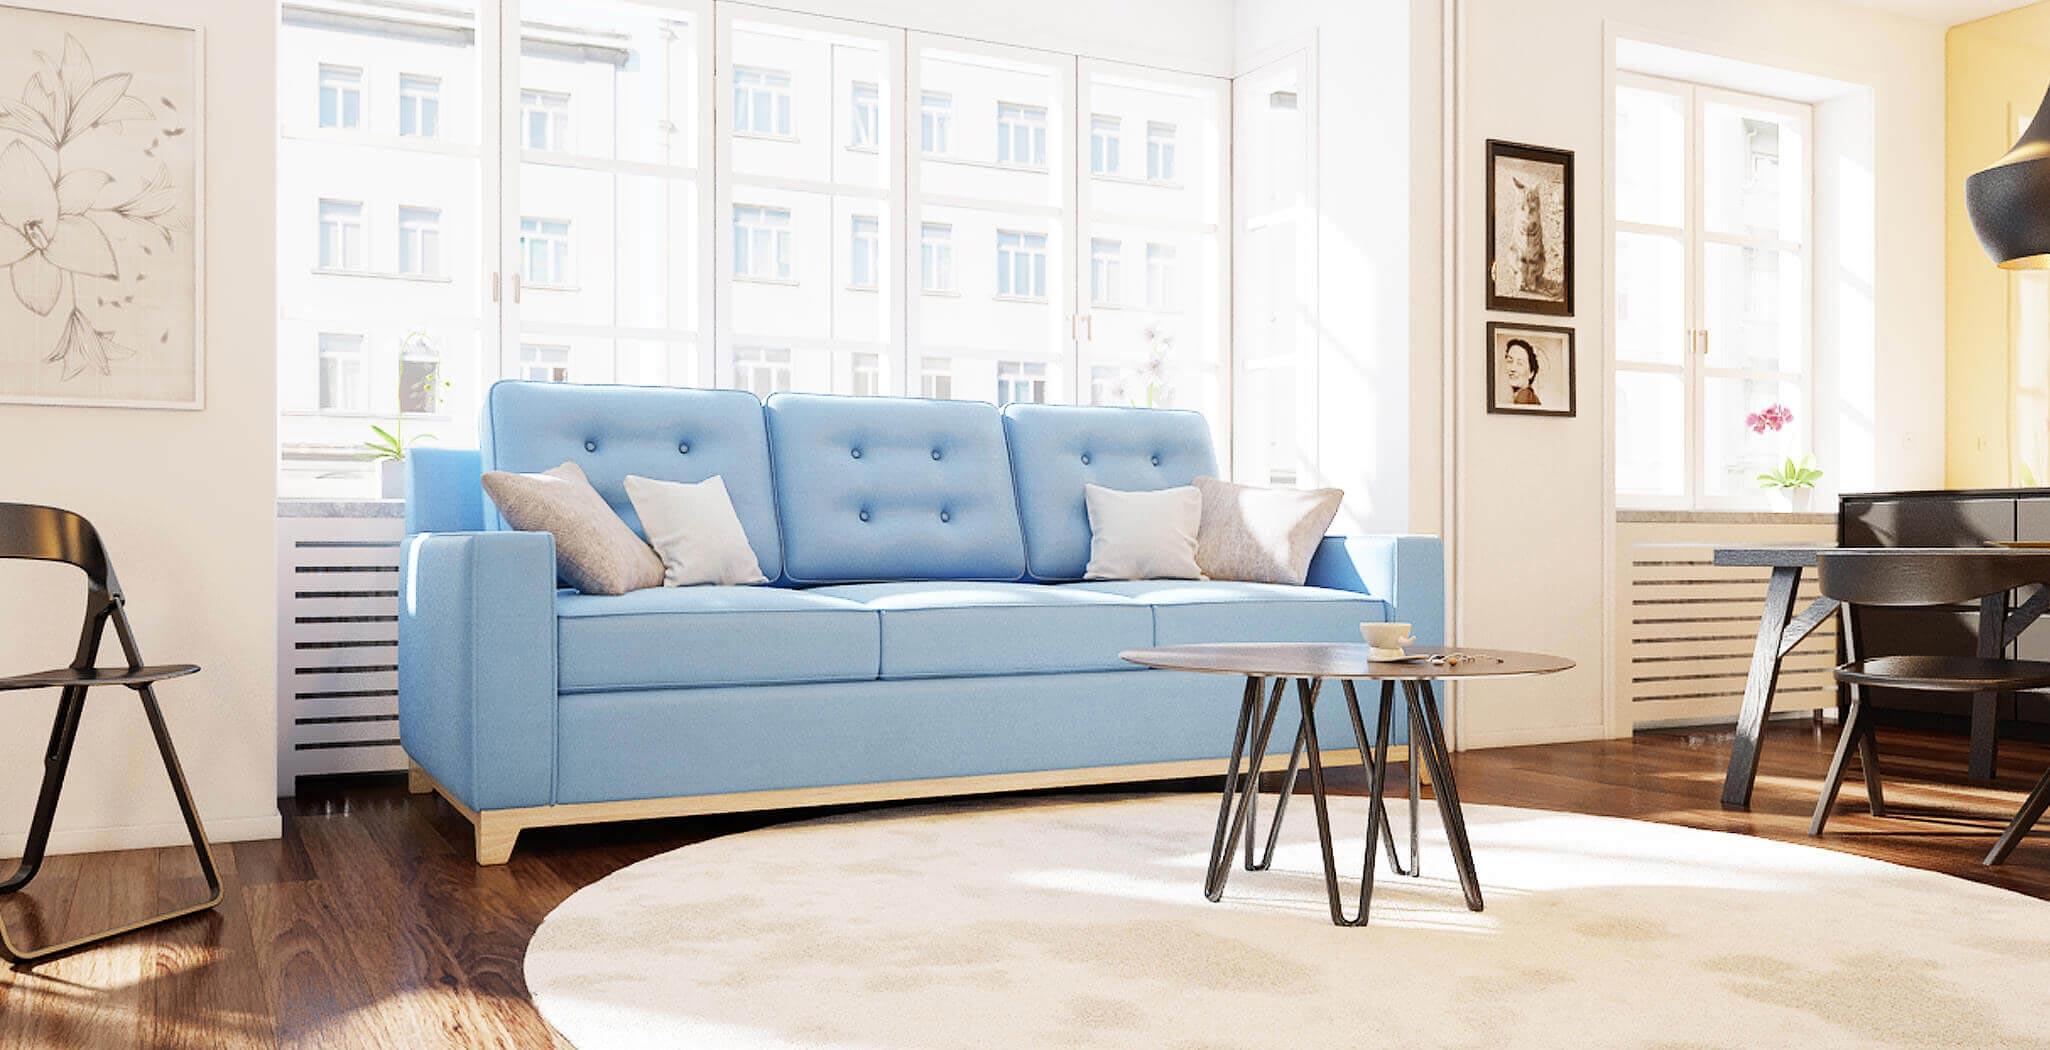 alexandria sofa furniture gallery 3